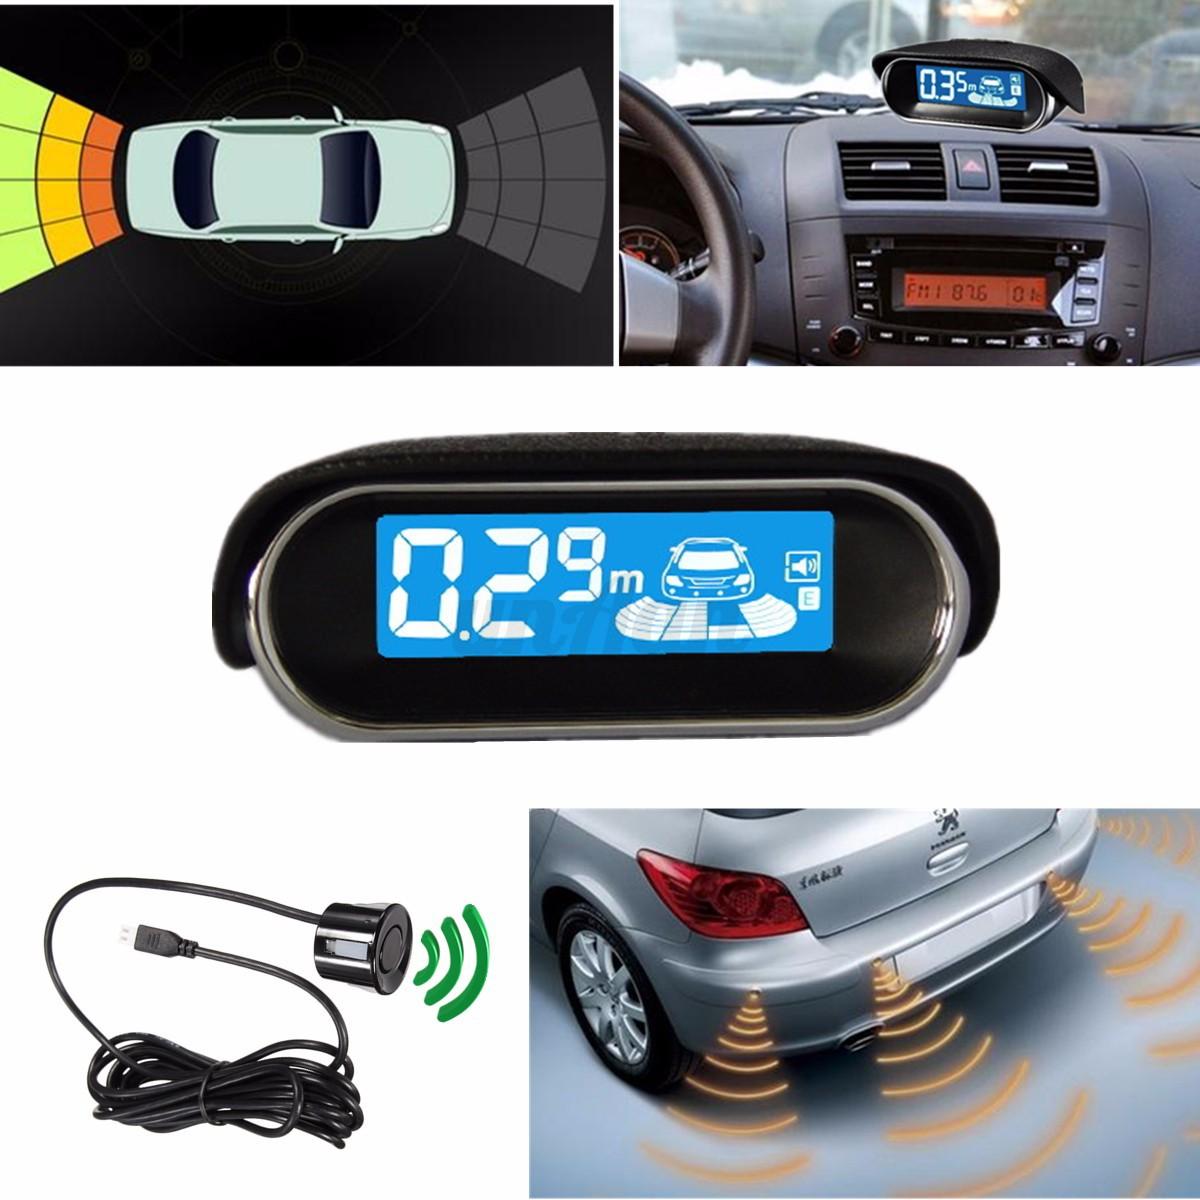 4 capteurs voiture radar de recul syst me led cran parcage car parking buzzer ebay. Black Bedroom Furniture Sets. Home Design Ideas